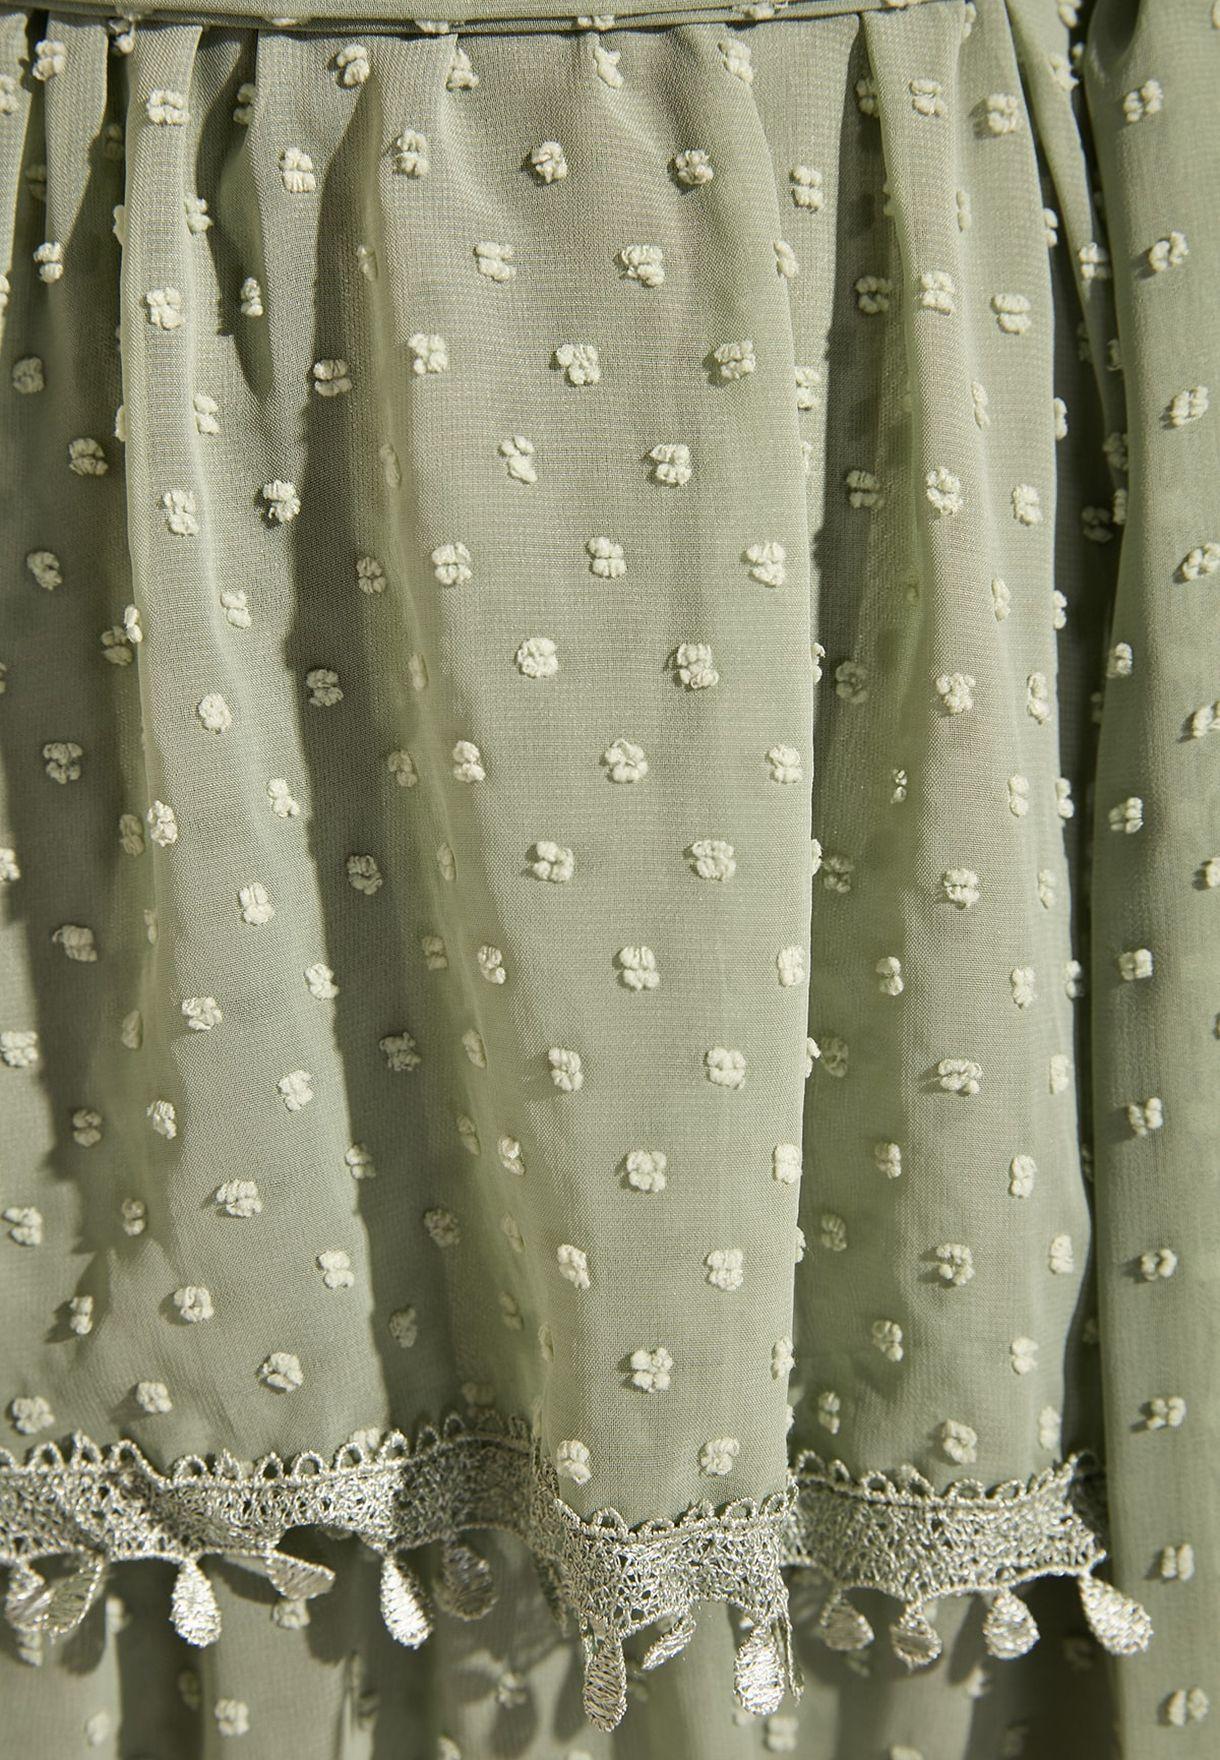 Cami Strap Layered Dress